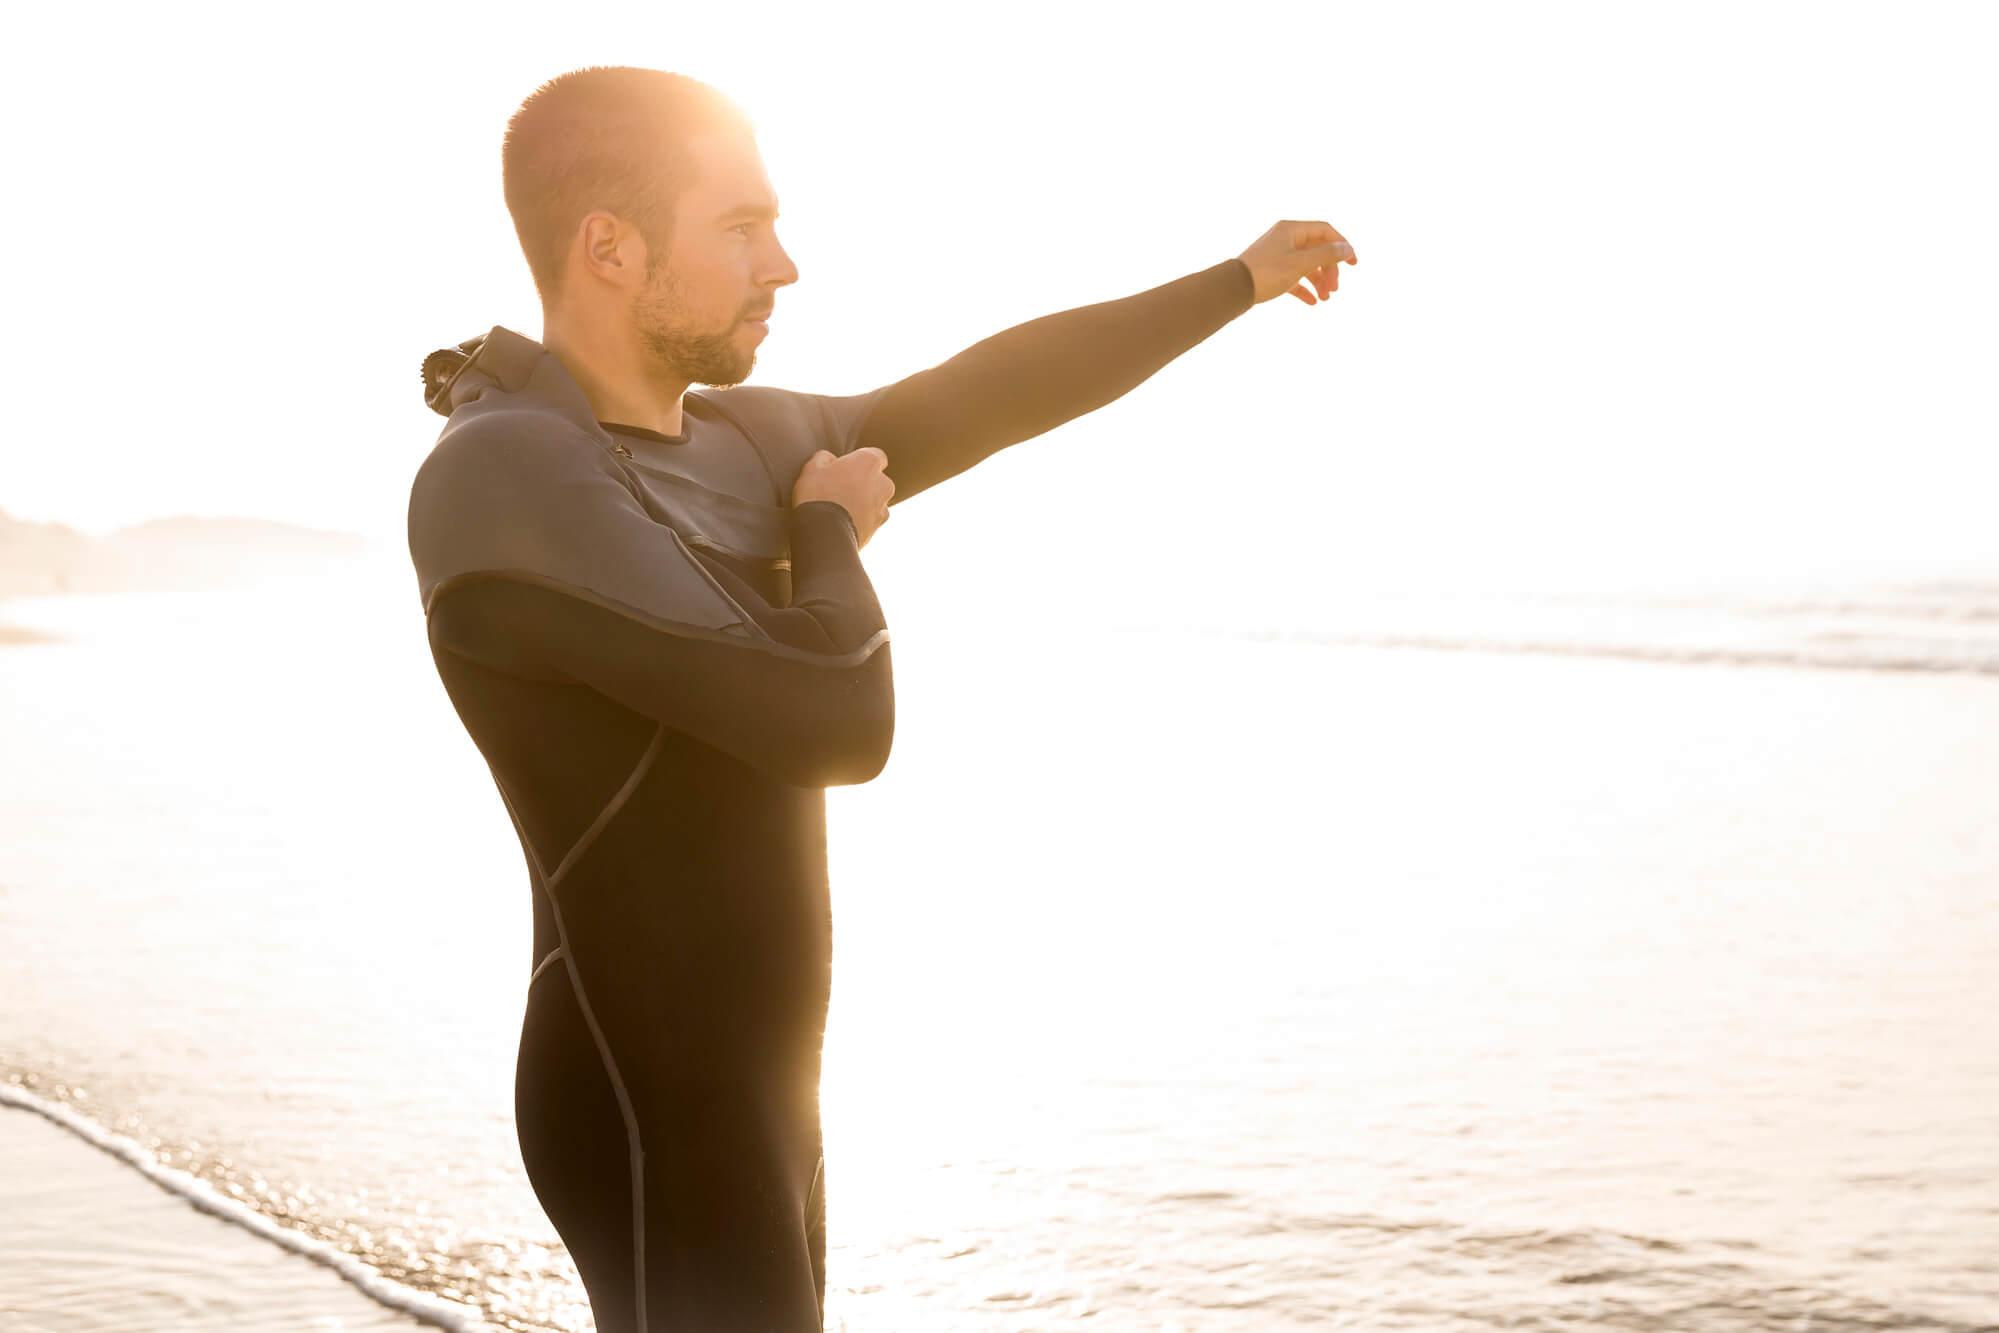 Man In Wetsuit On Beach